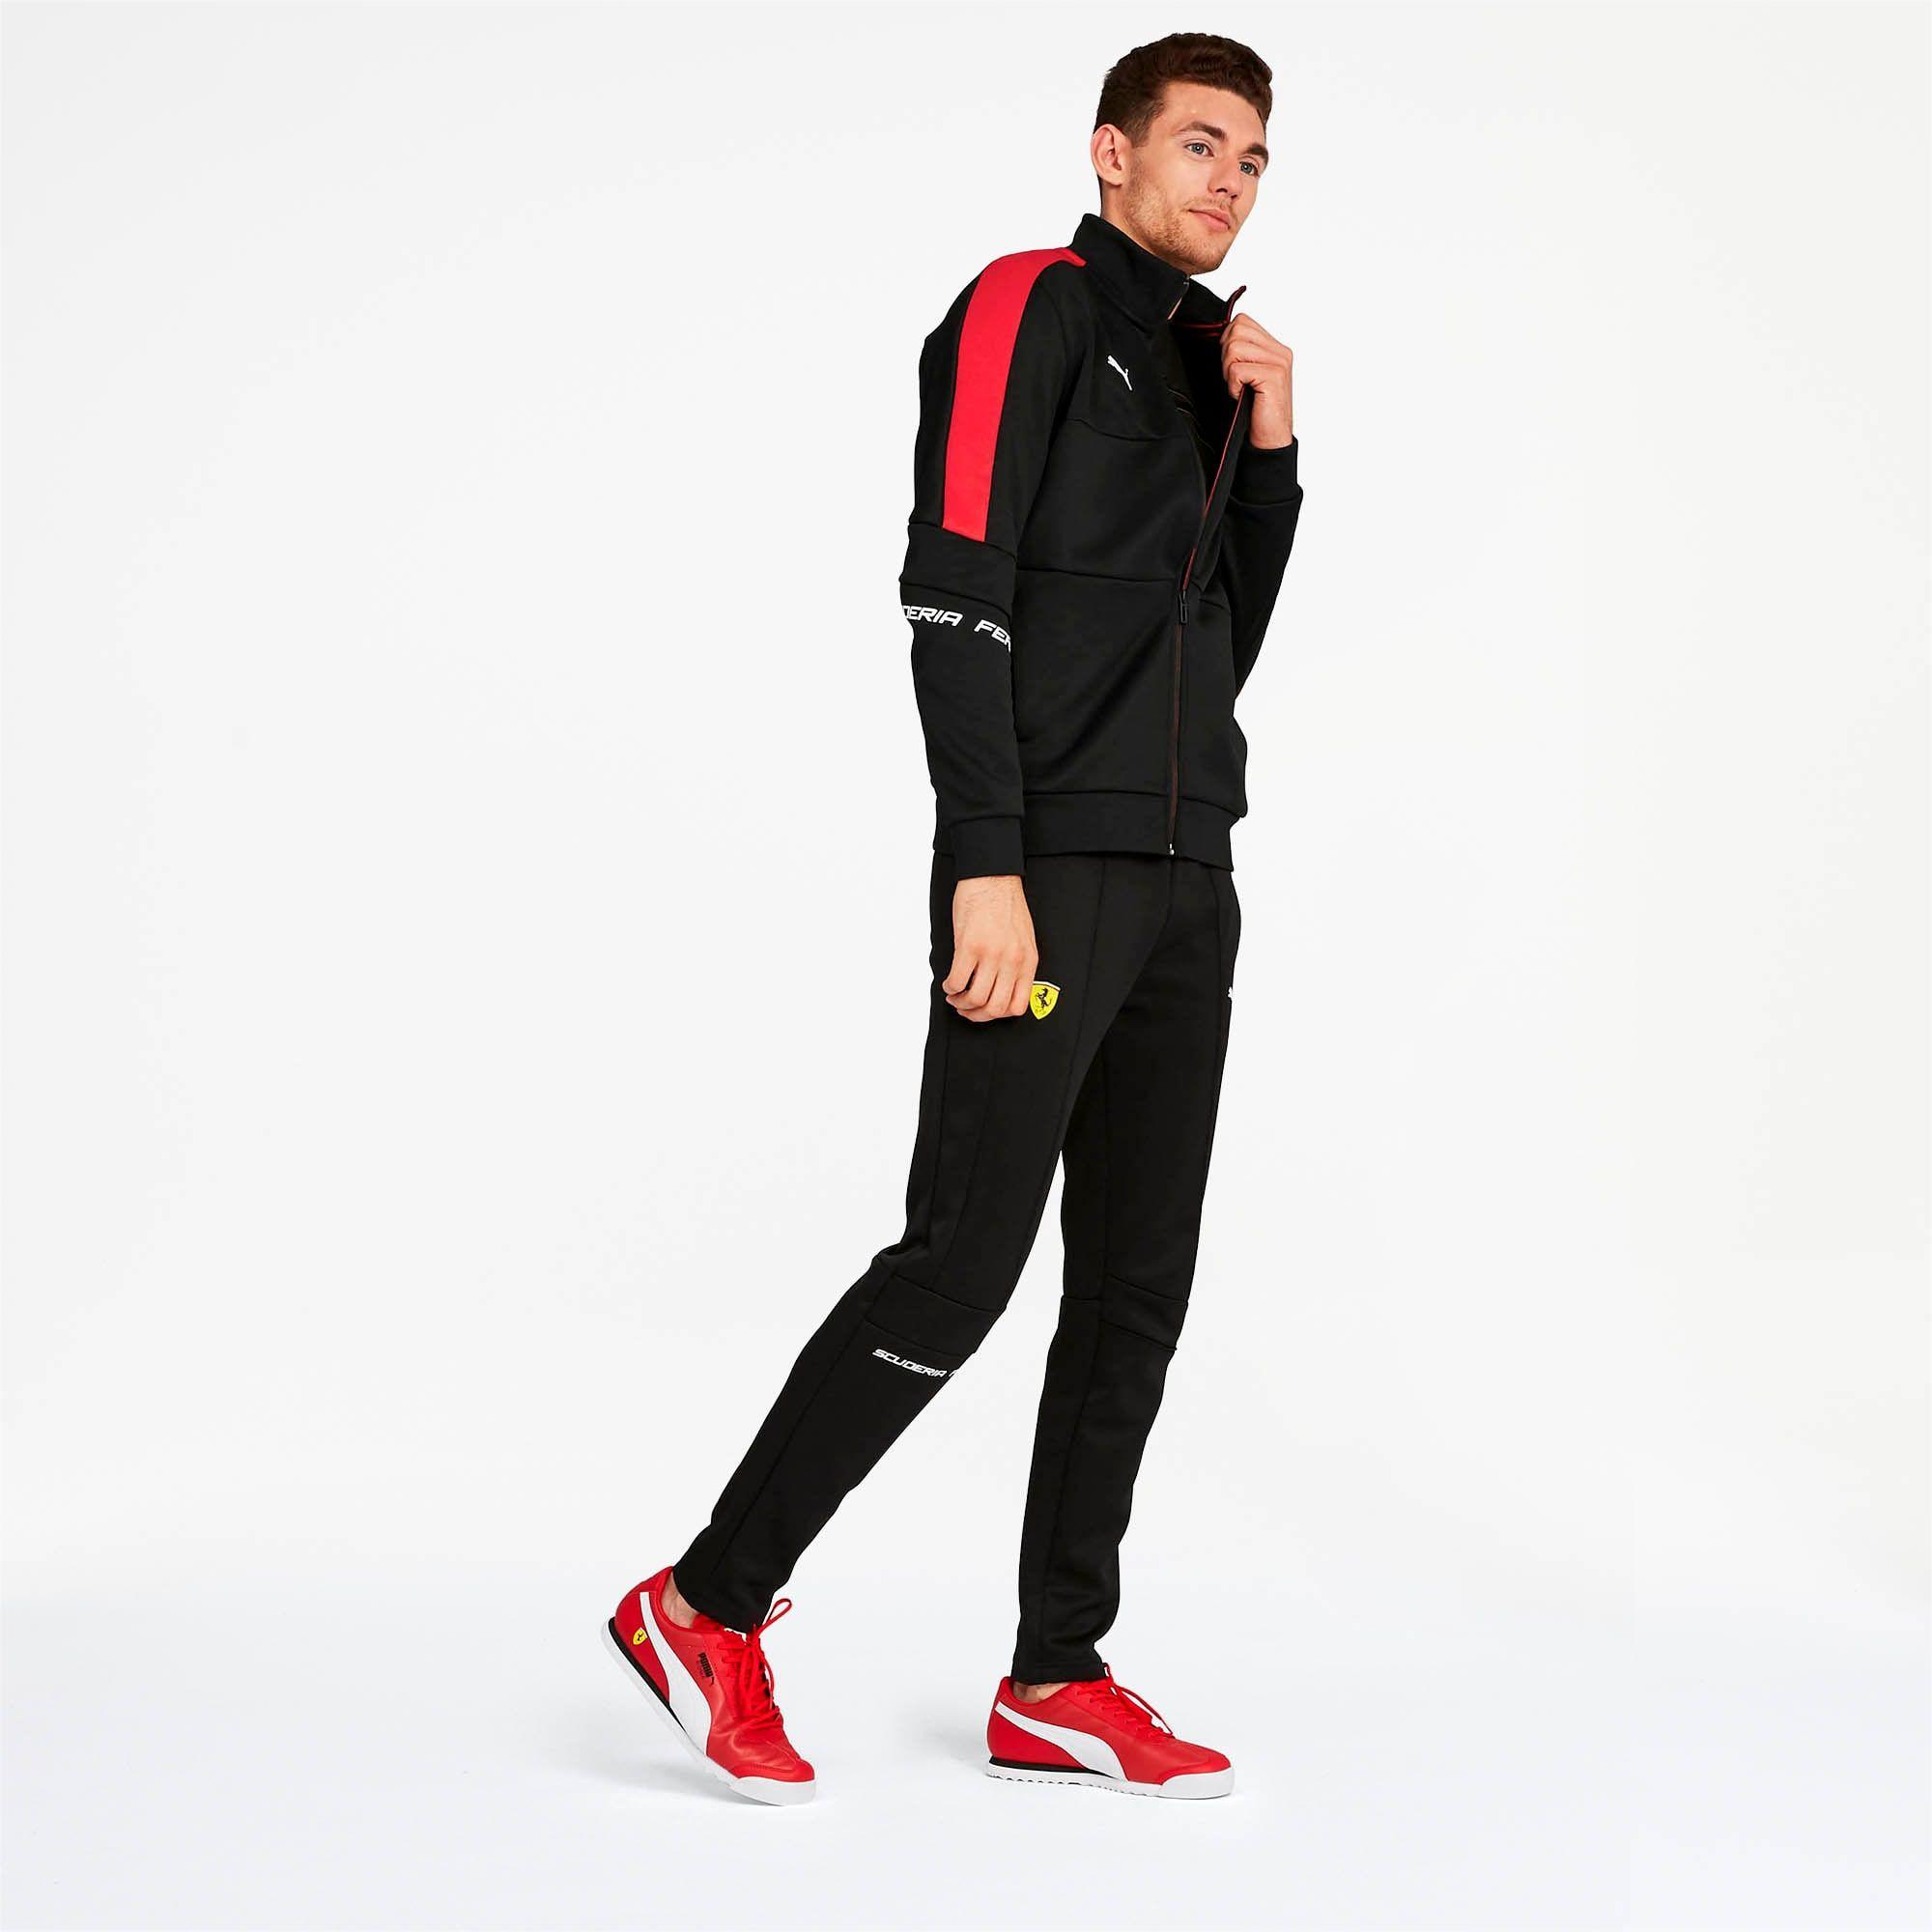 Scuderia Ferrari Men S T7 Track Jacket Puma Us Track Jackets Jackets Outerwear Jackets